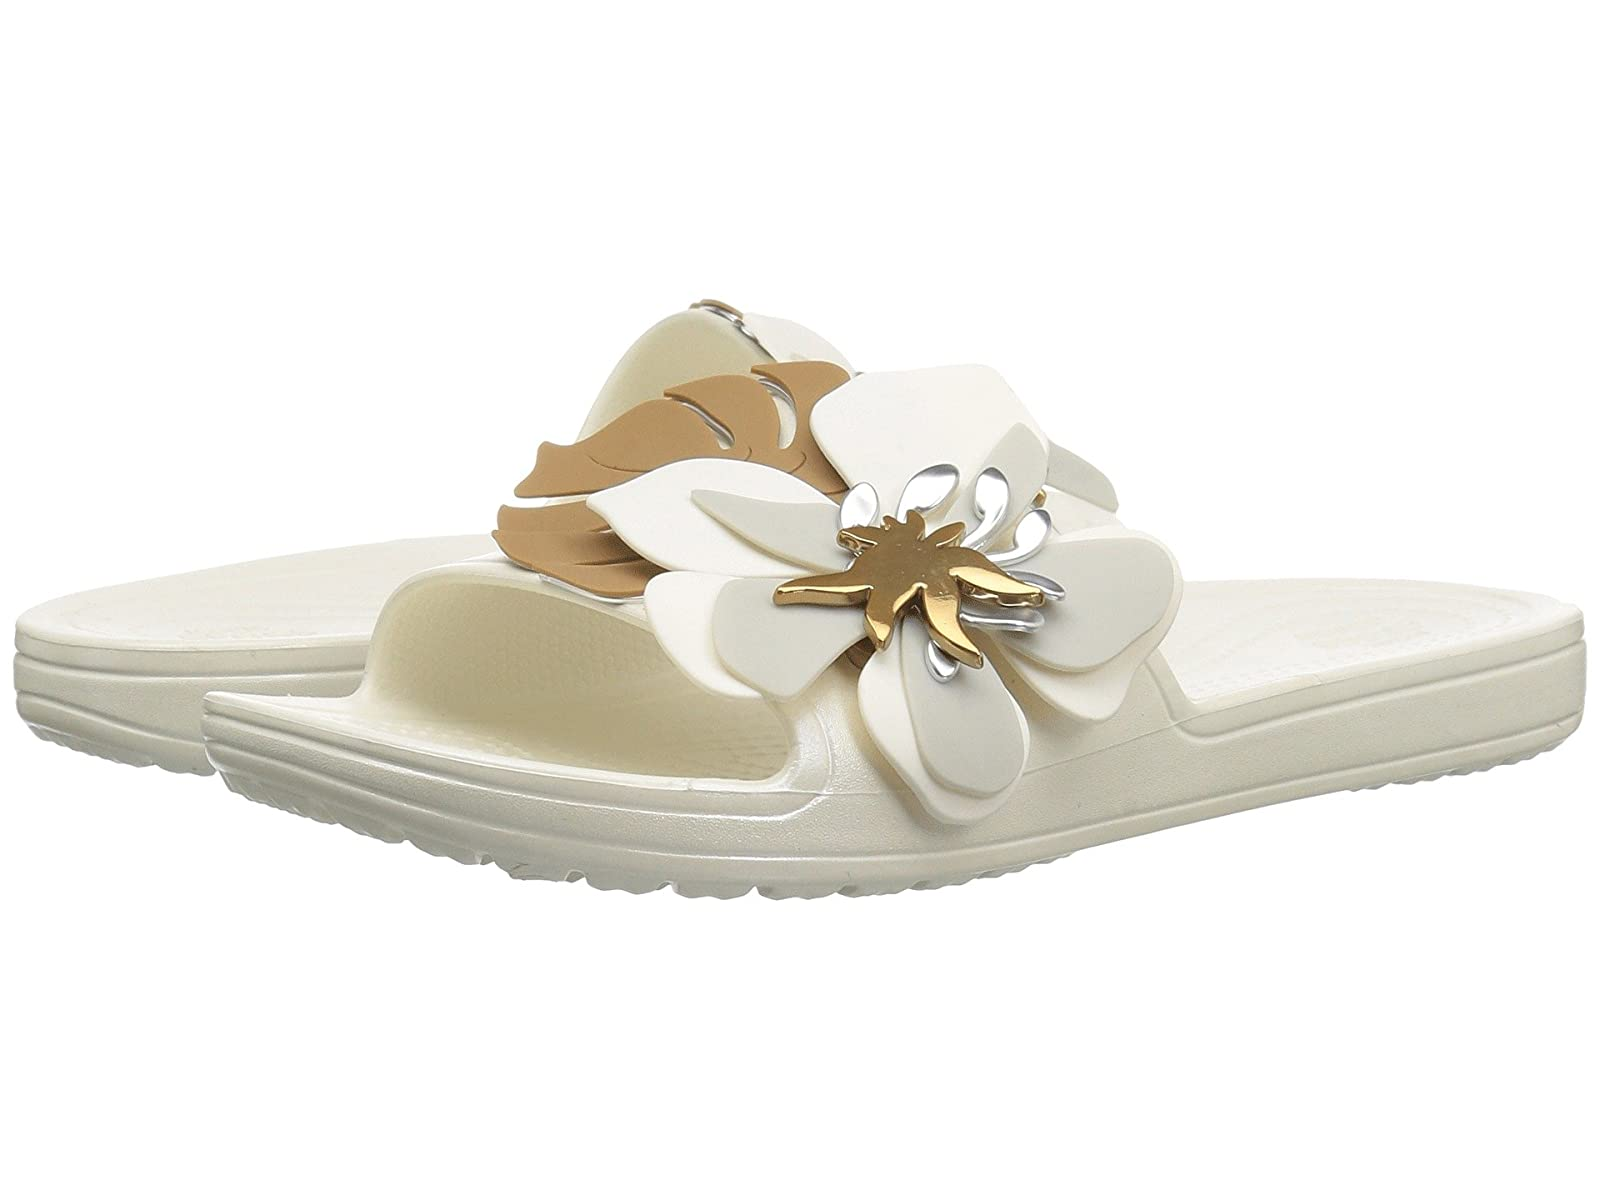 Crocs Crocs Sloane Botanical Floral SlideComfortable and distinctive shoes